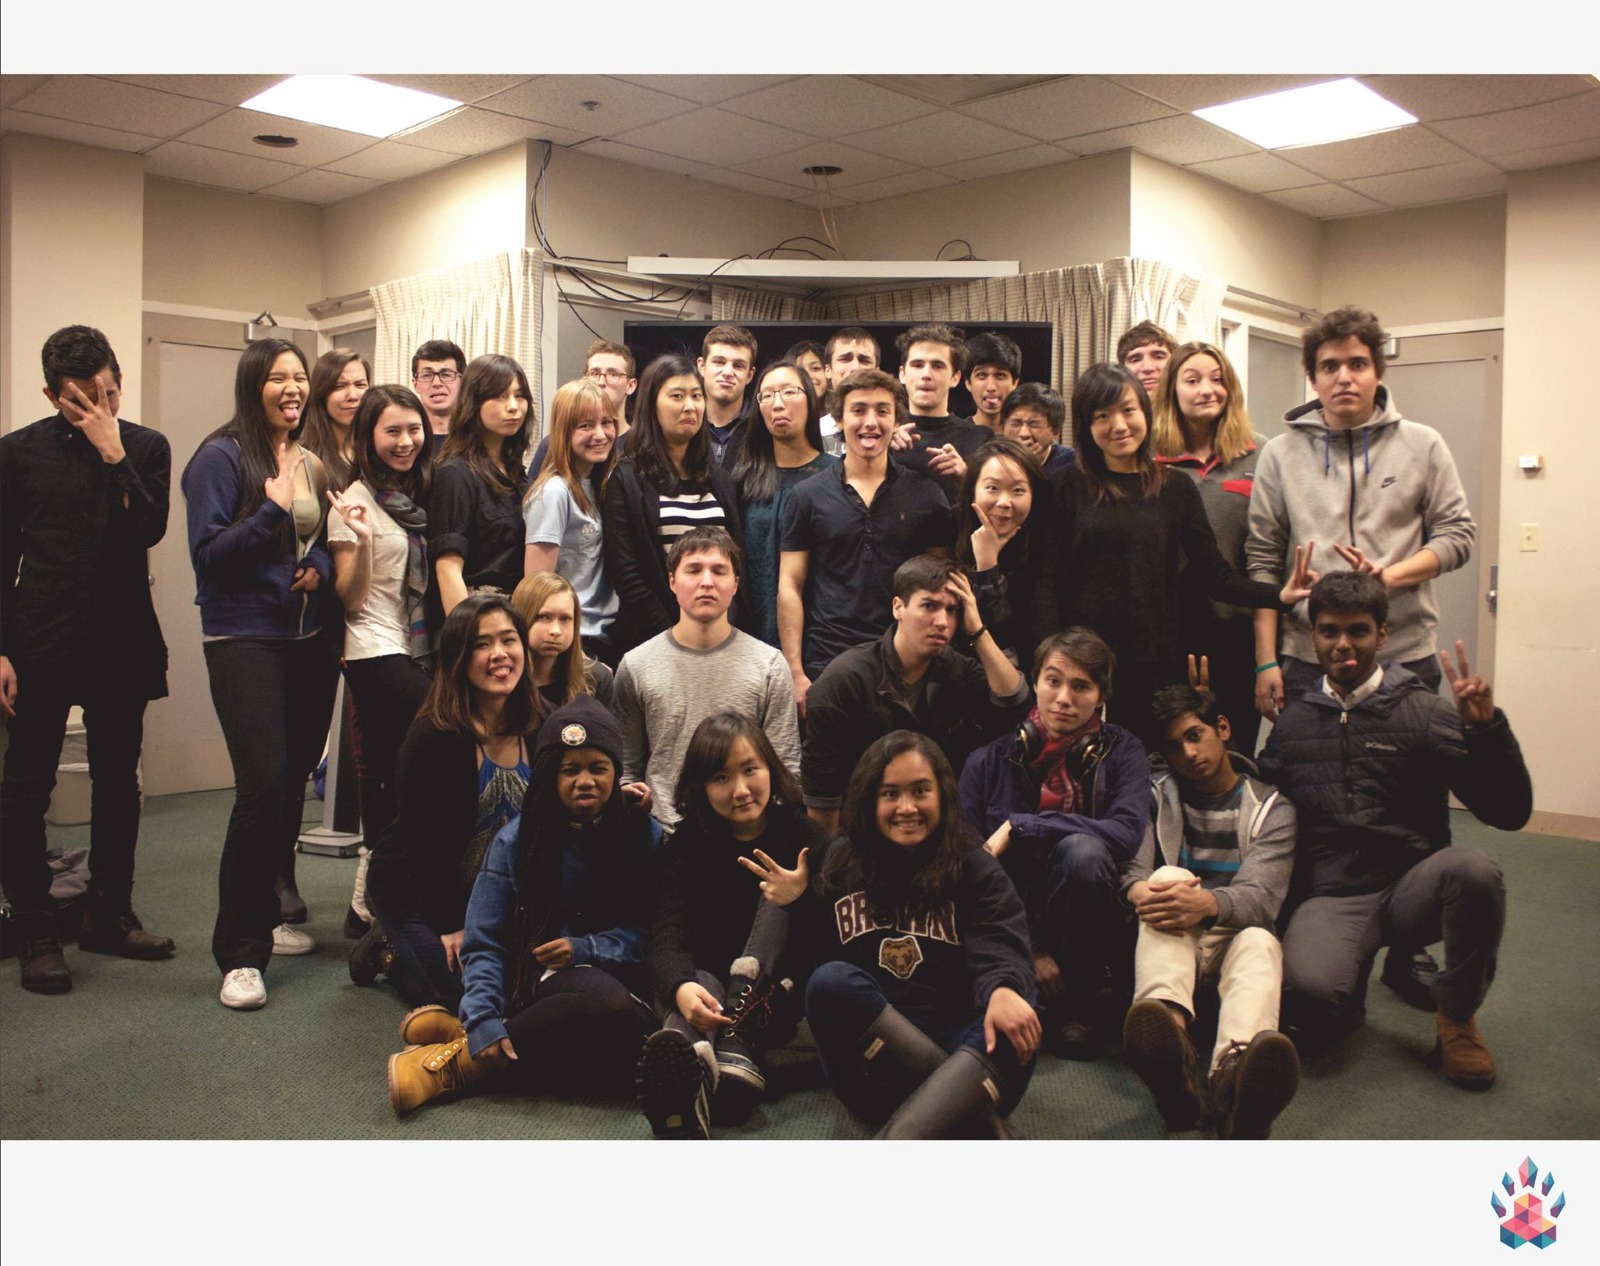 Indira with Hack@Brown teammates in 2015. Photo credit to Hack@Brown https://2020.hackatbrown.org/